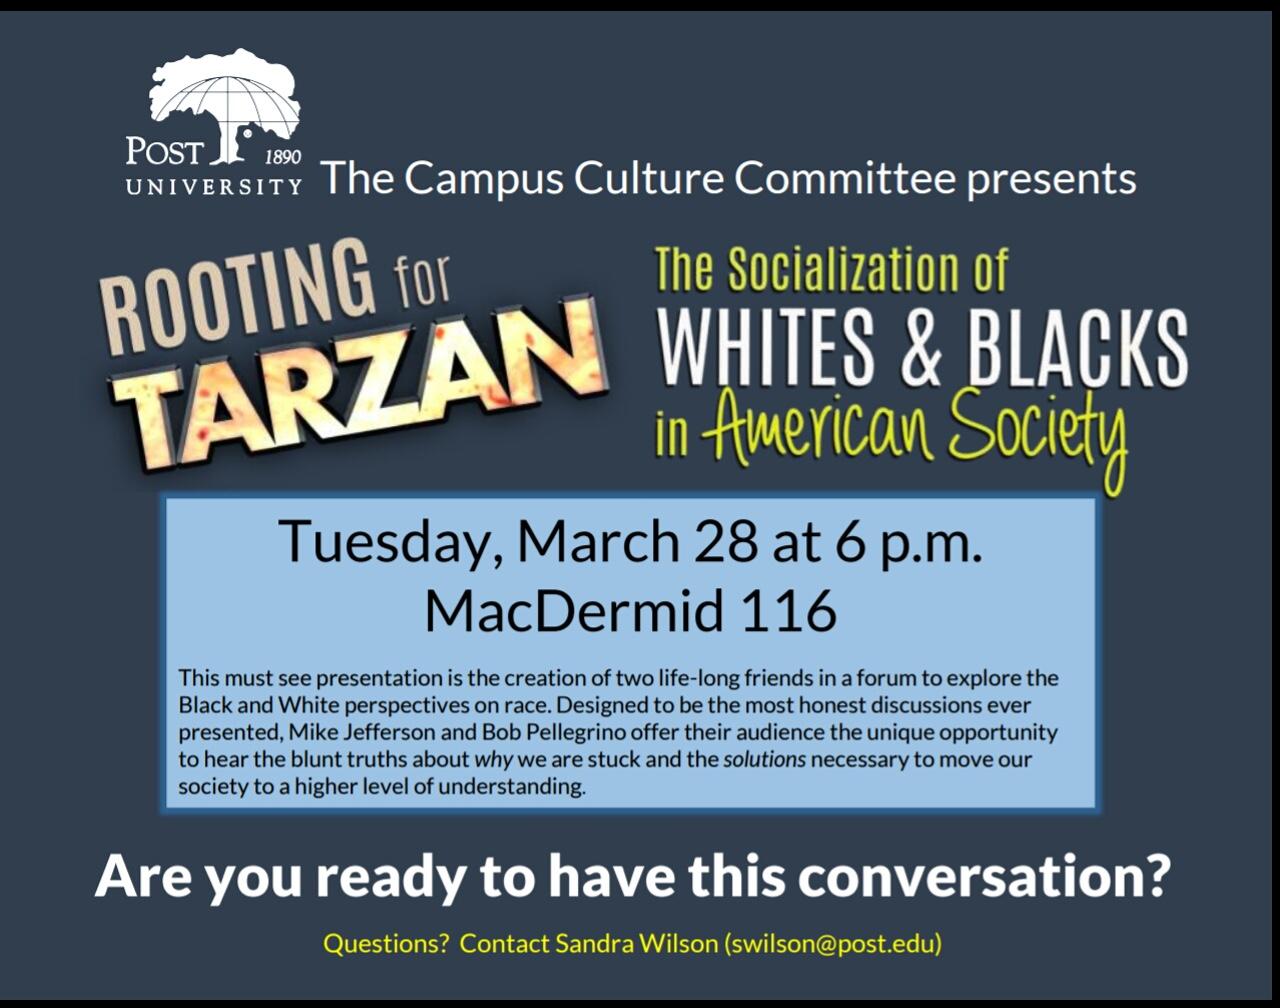 Rooting for Tarzan presents at Post University